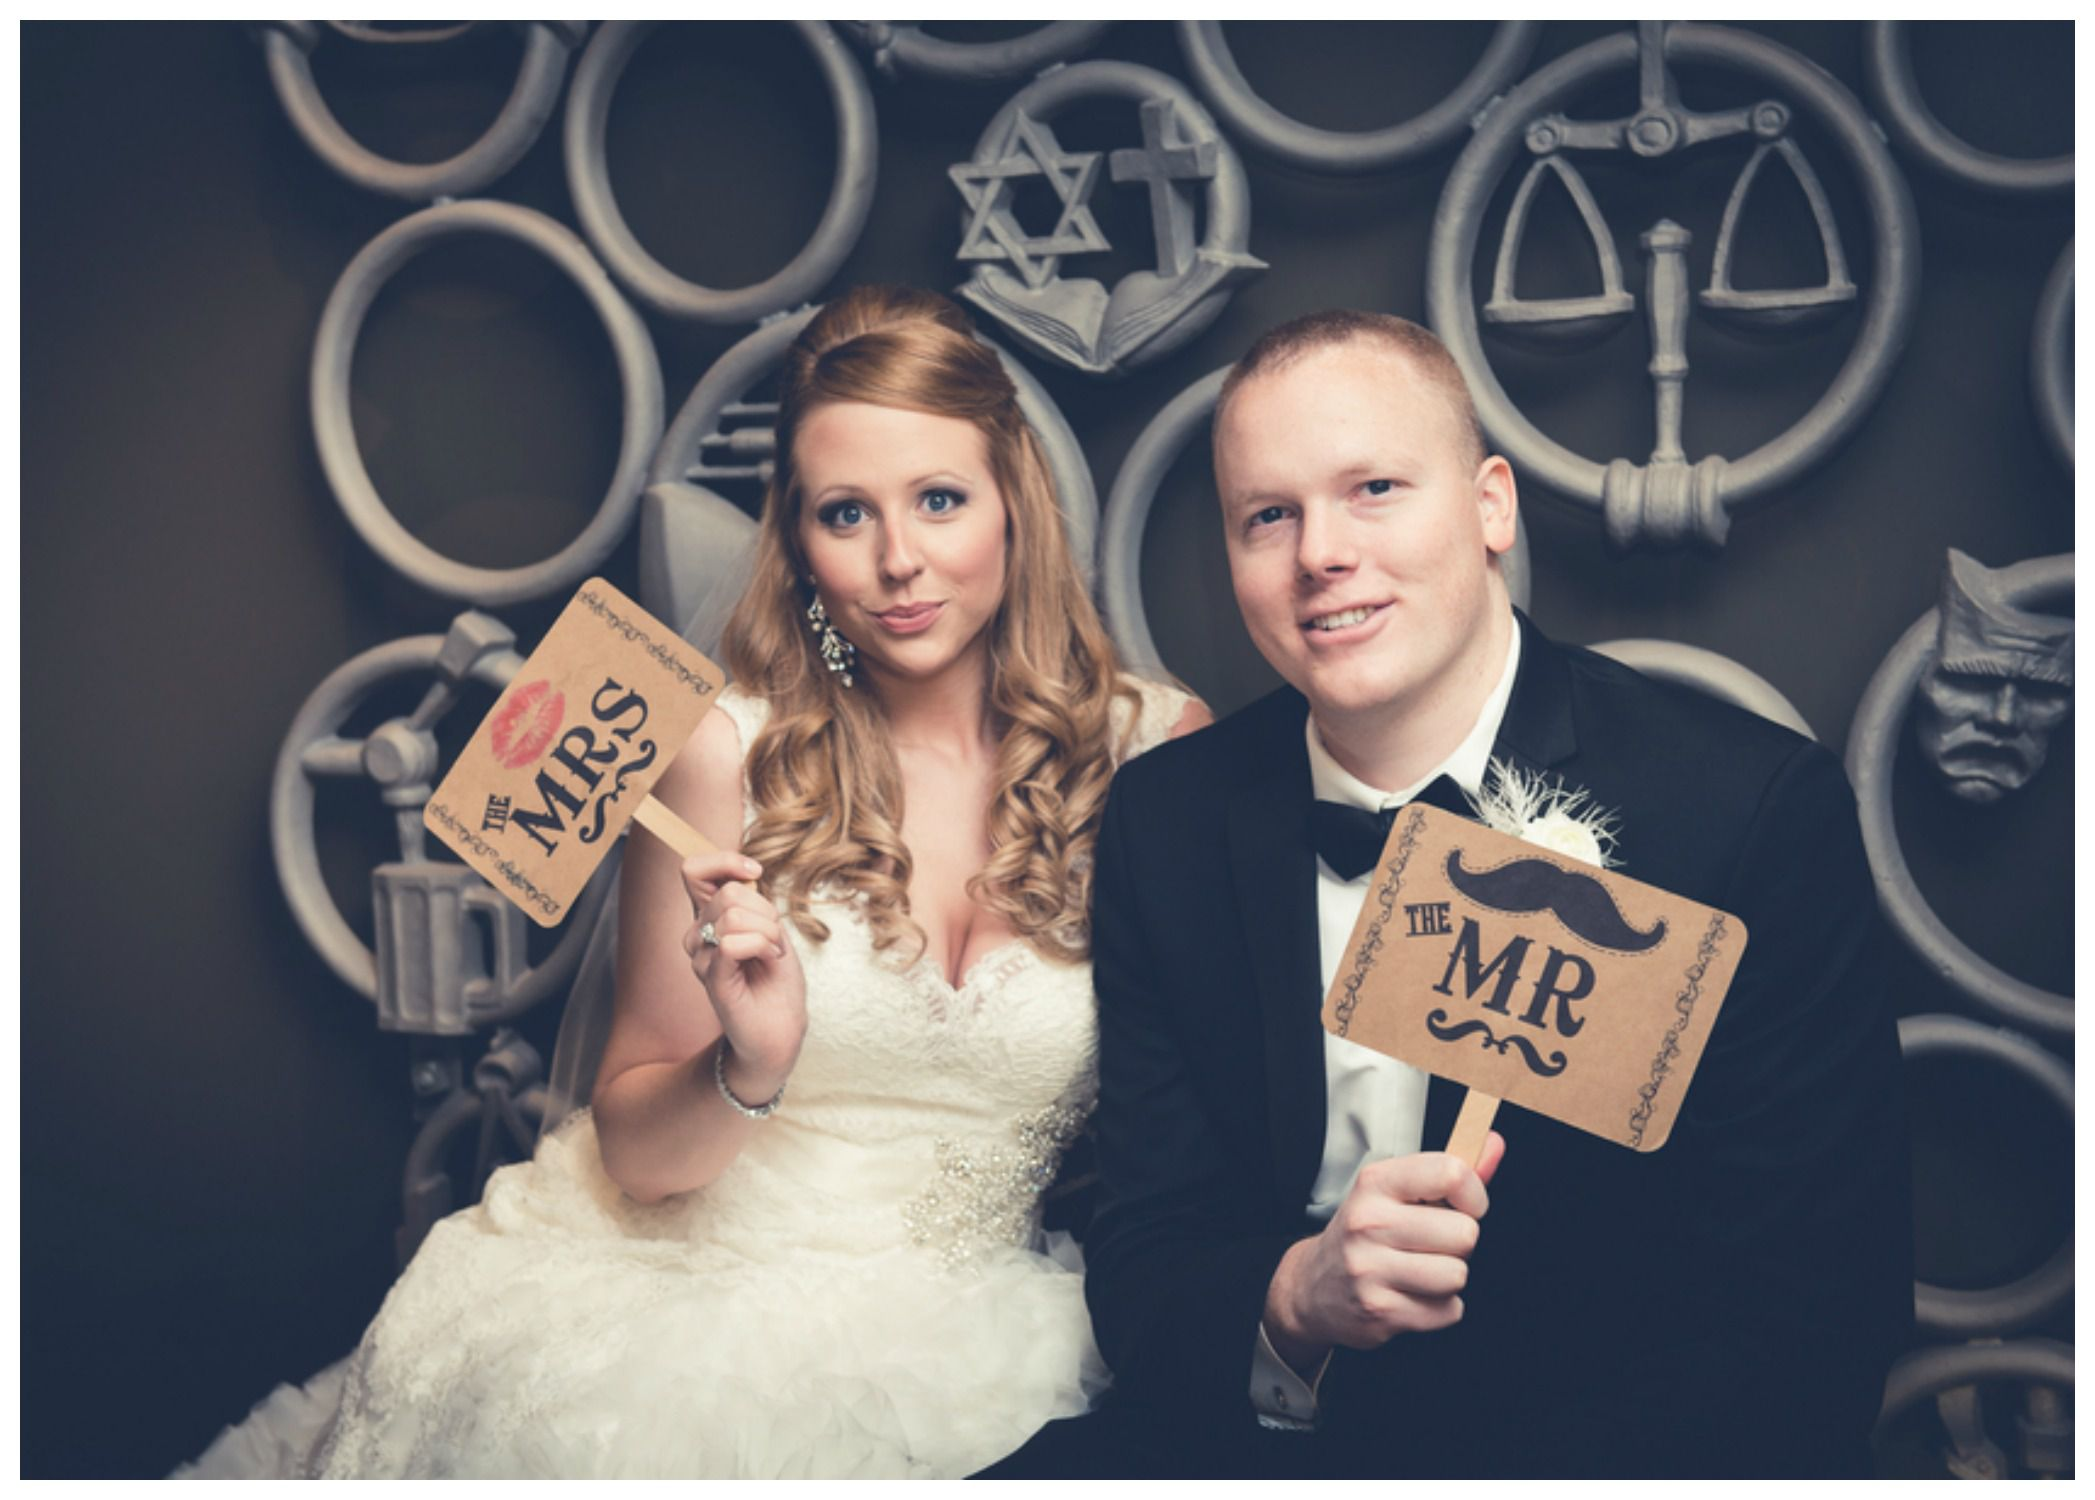 Great Wedding Photobooth